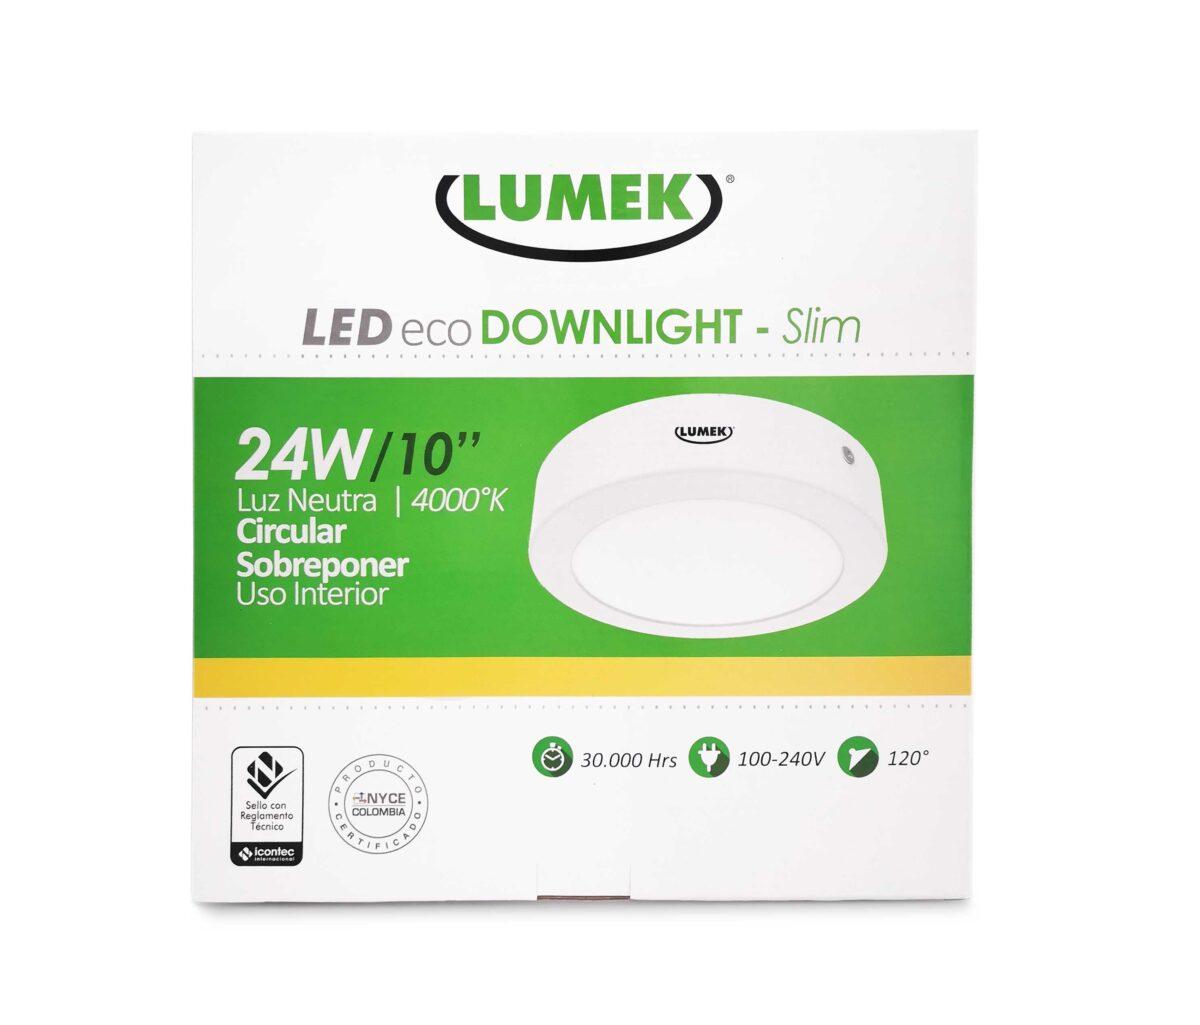 Luminaria Led Eco Downlight Bc10 Slim 24W 4000K